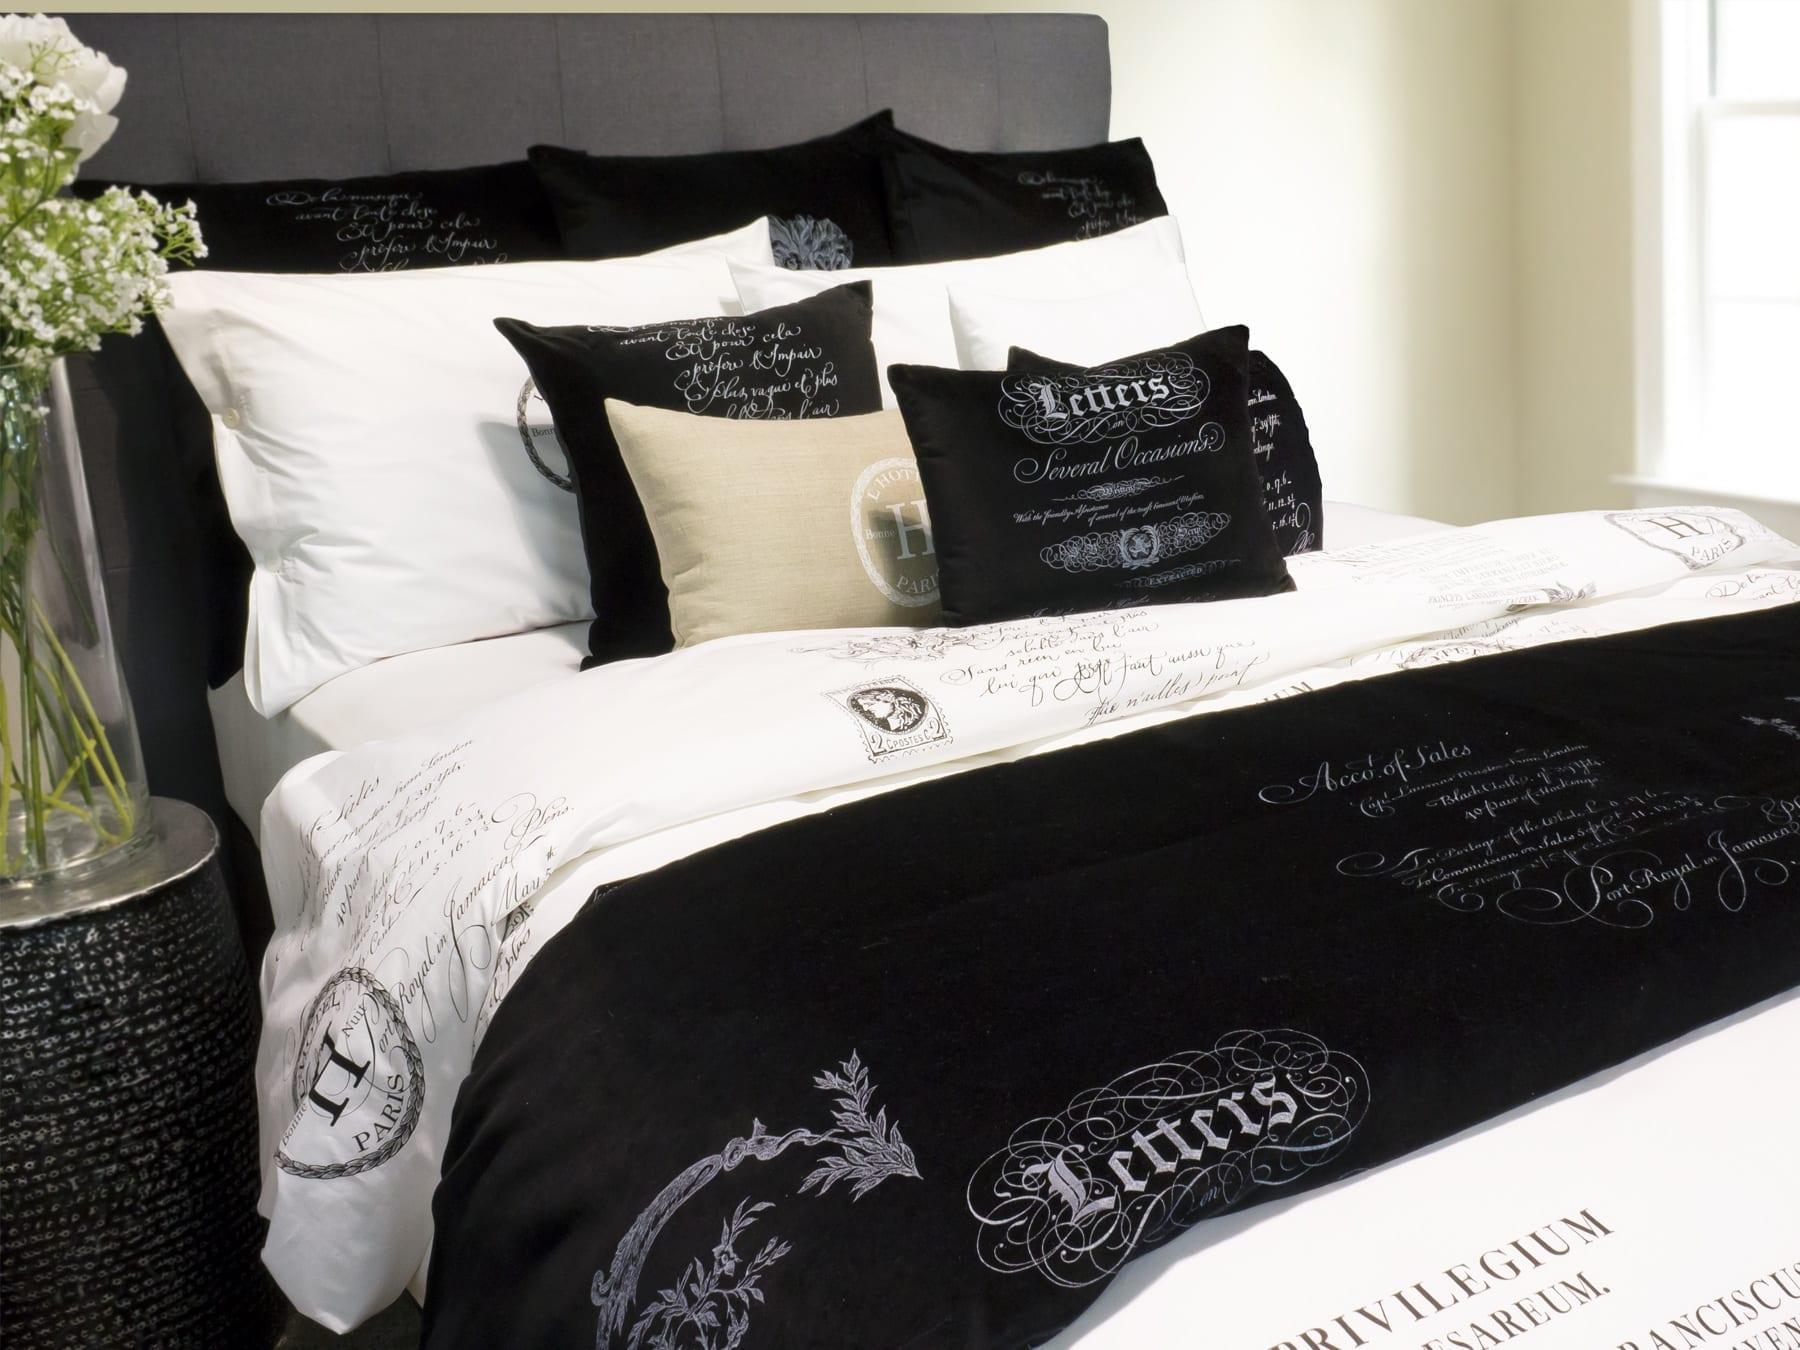 Arcanum Black Calligraphy Bed Linen range